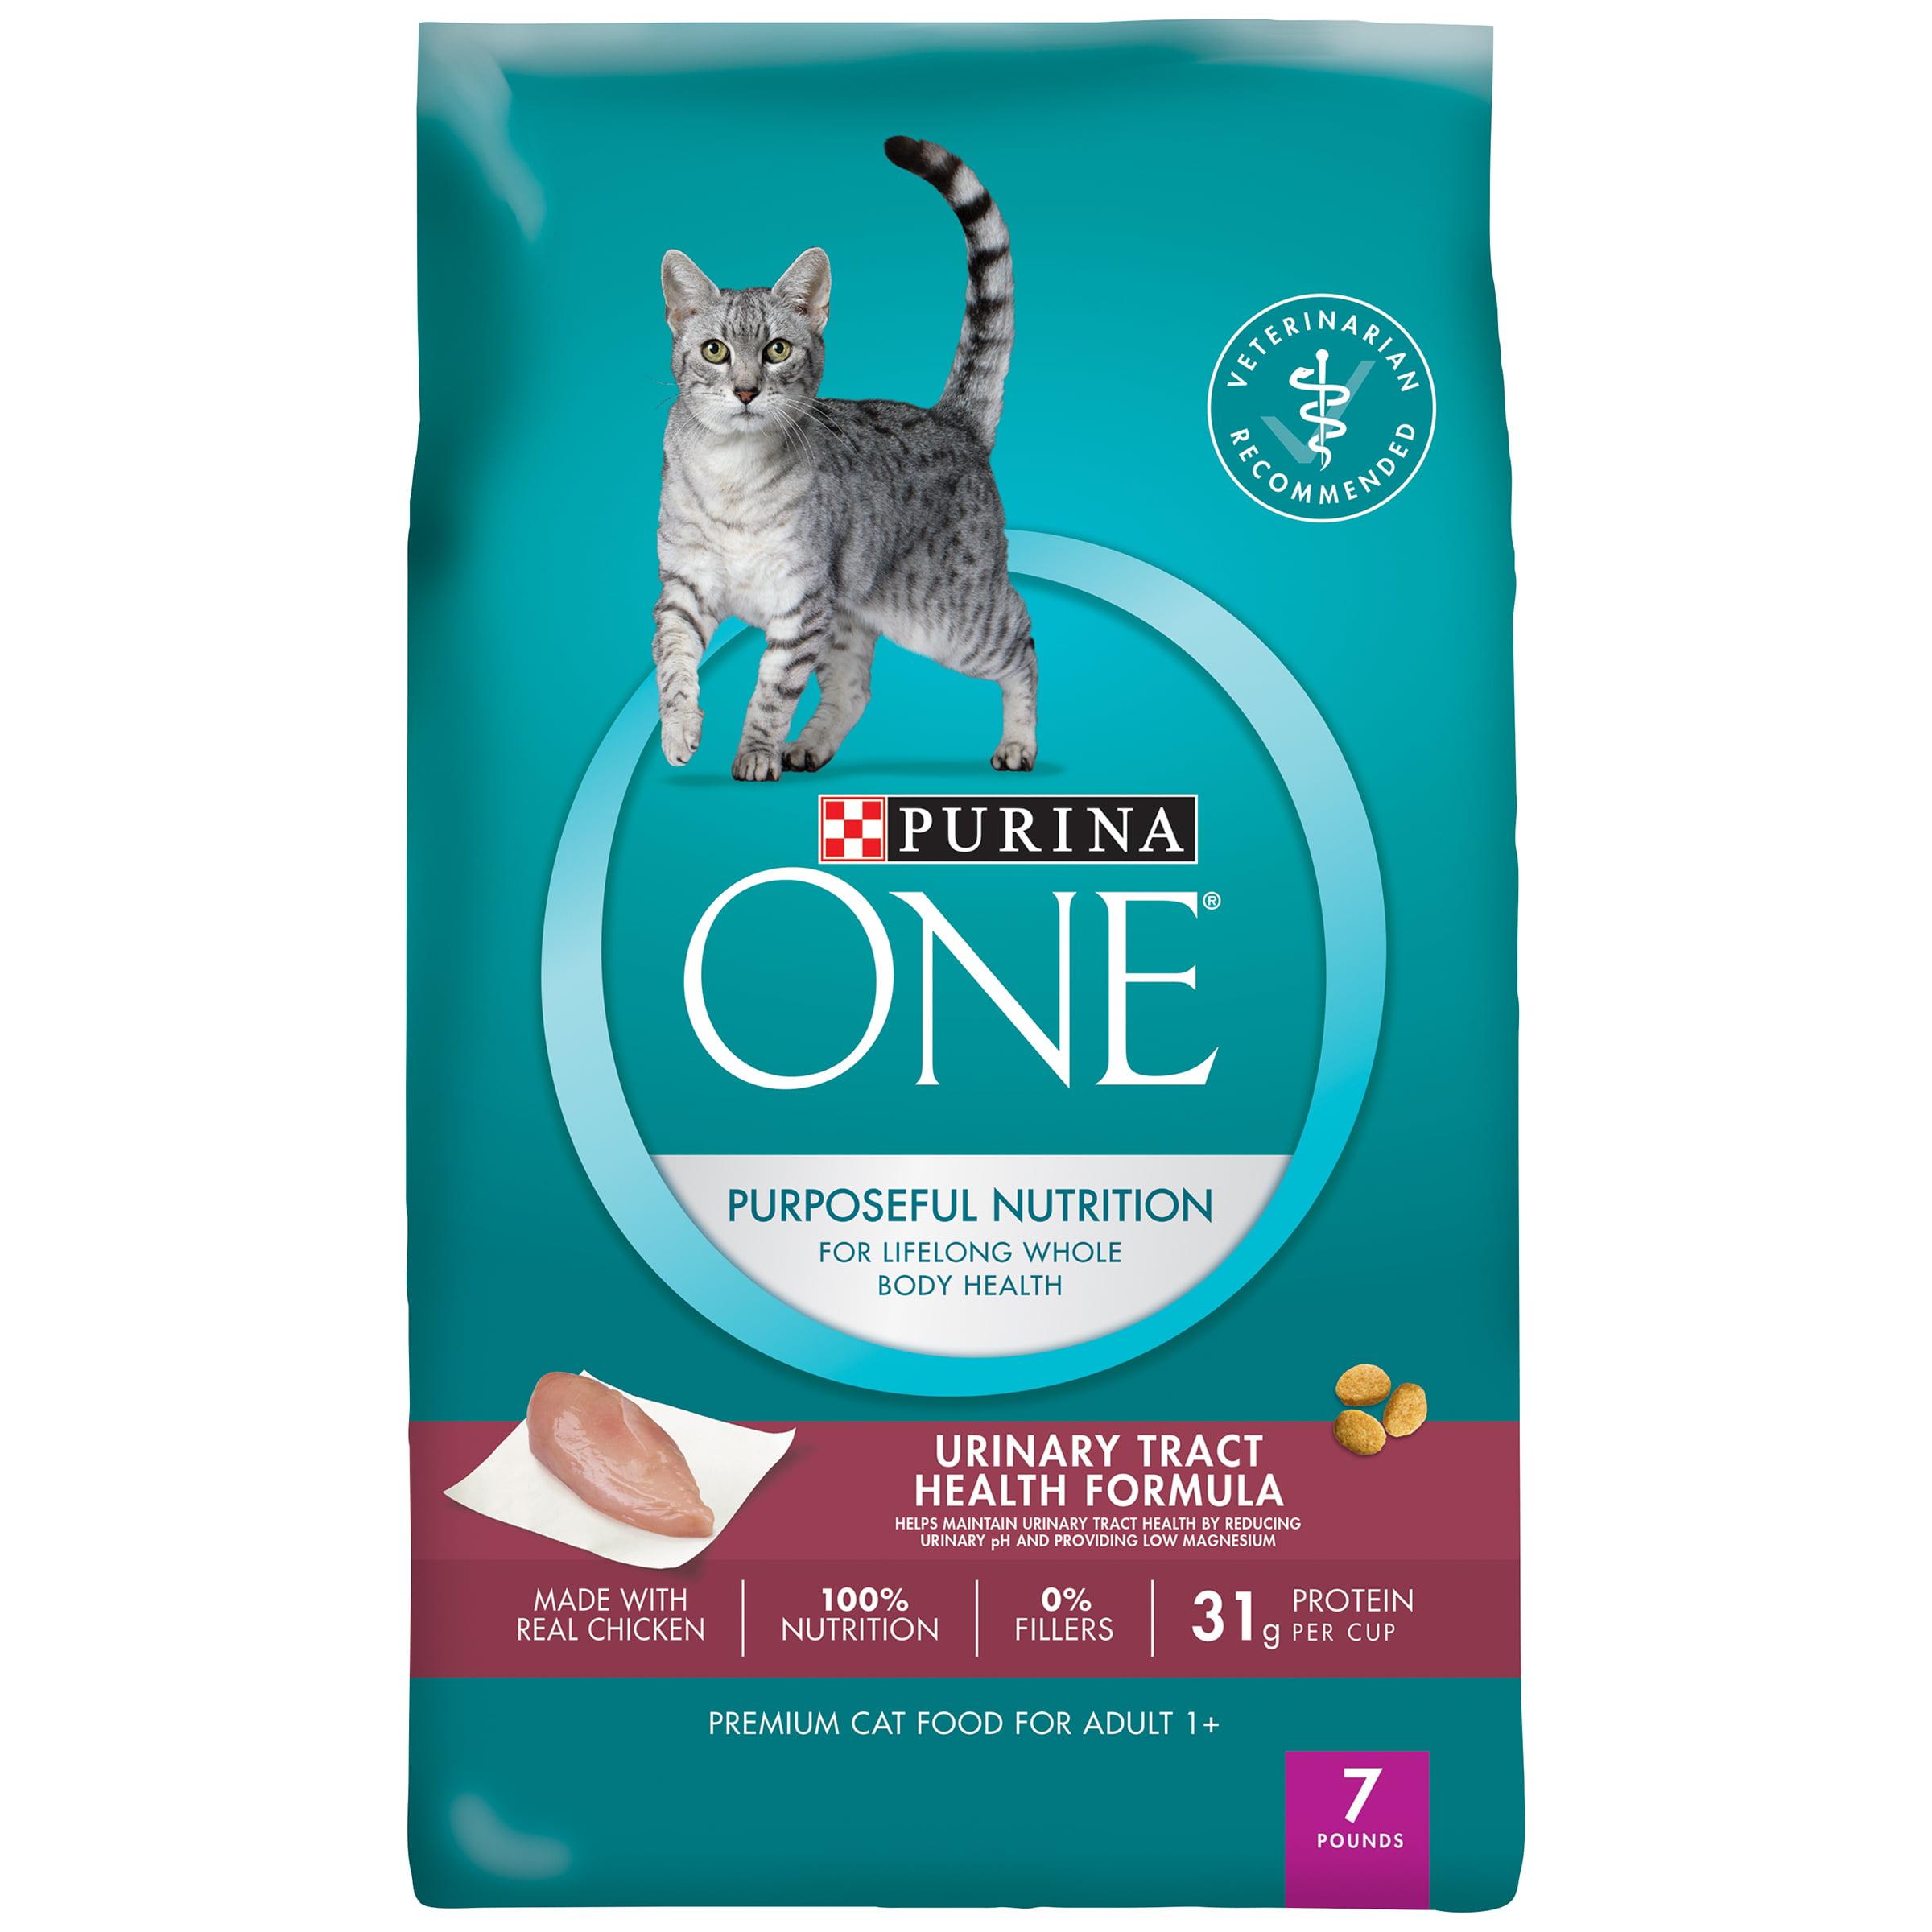 Purina ONE Urinary Tract Health Formula Adult Premium Cat Food 7 lb ...